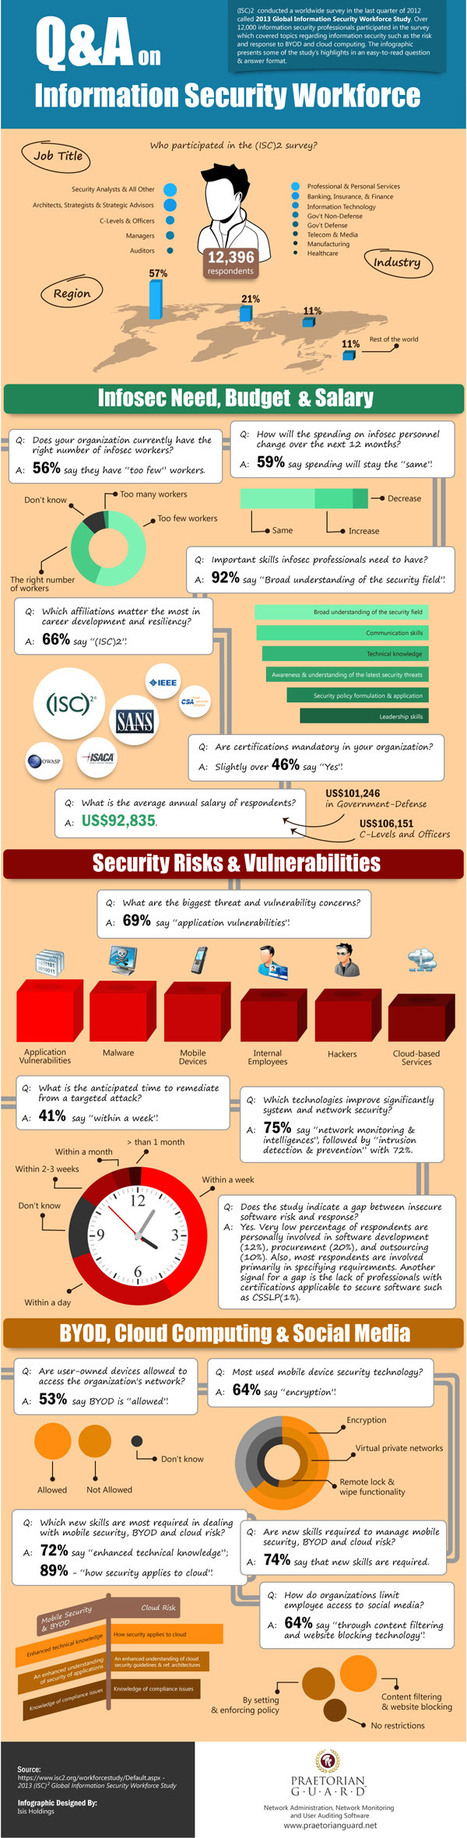 Infographic: Q&A on Information Security Workforce | Ciberseguridad + Inteligencia | Scoop.it